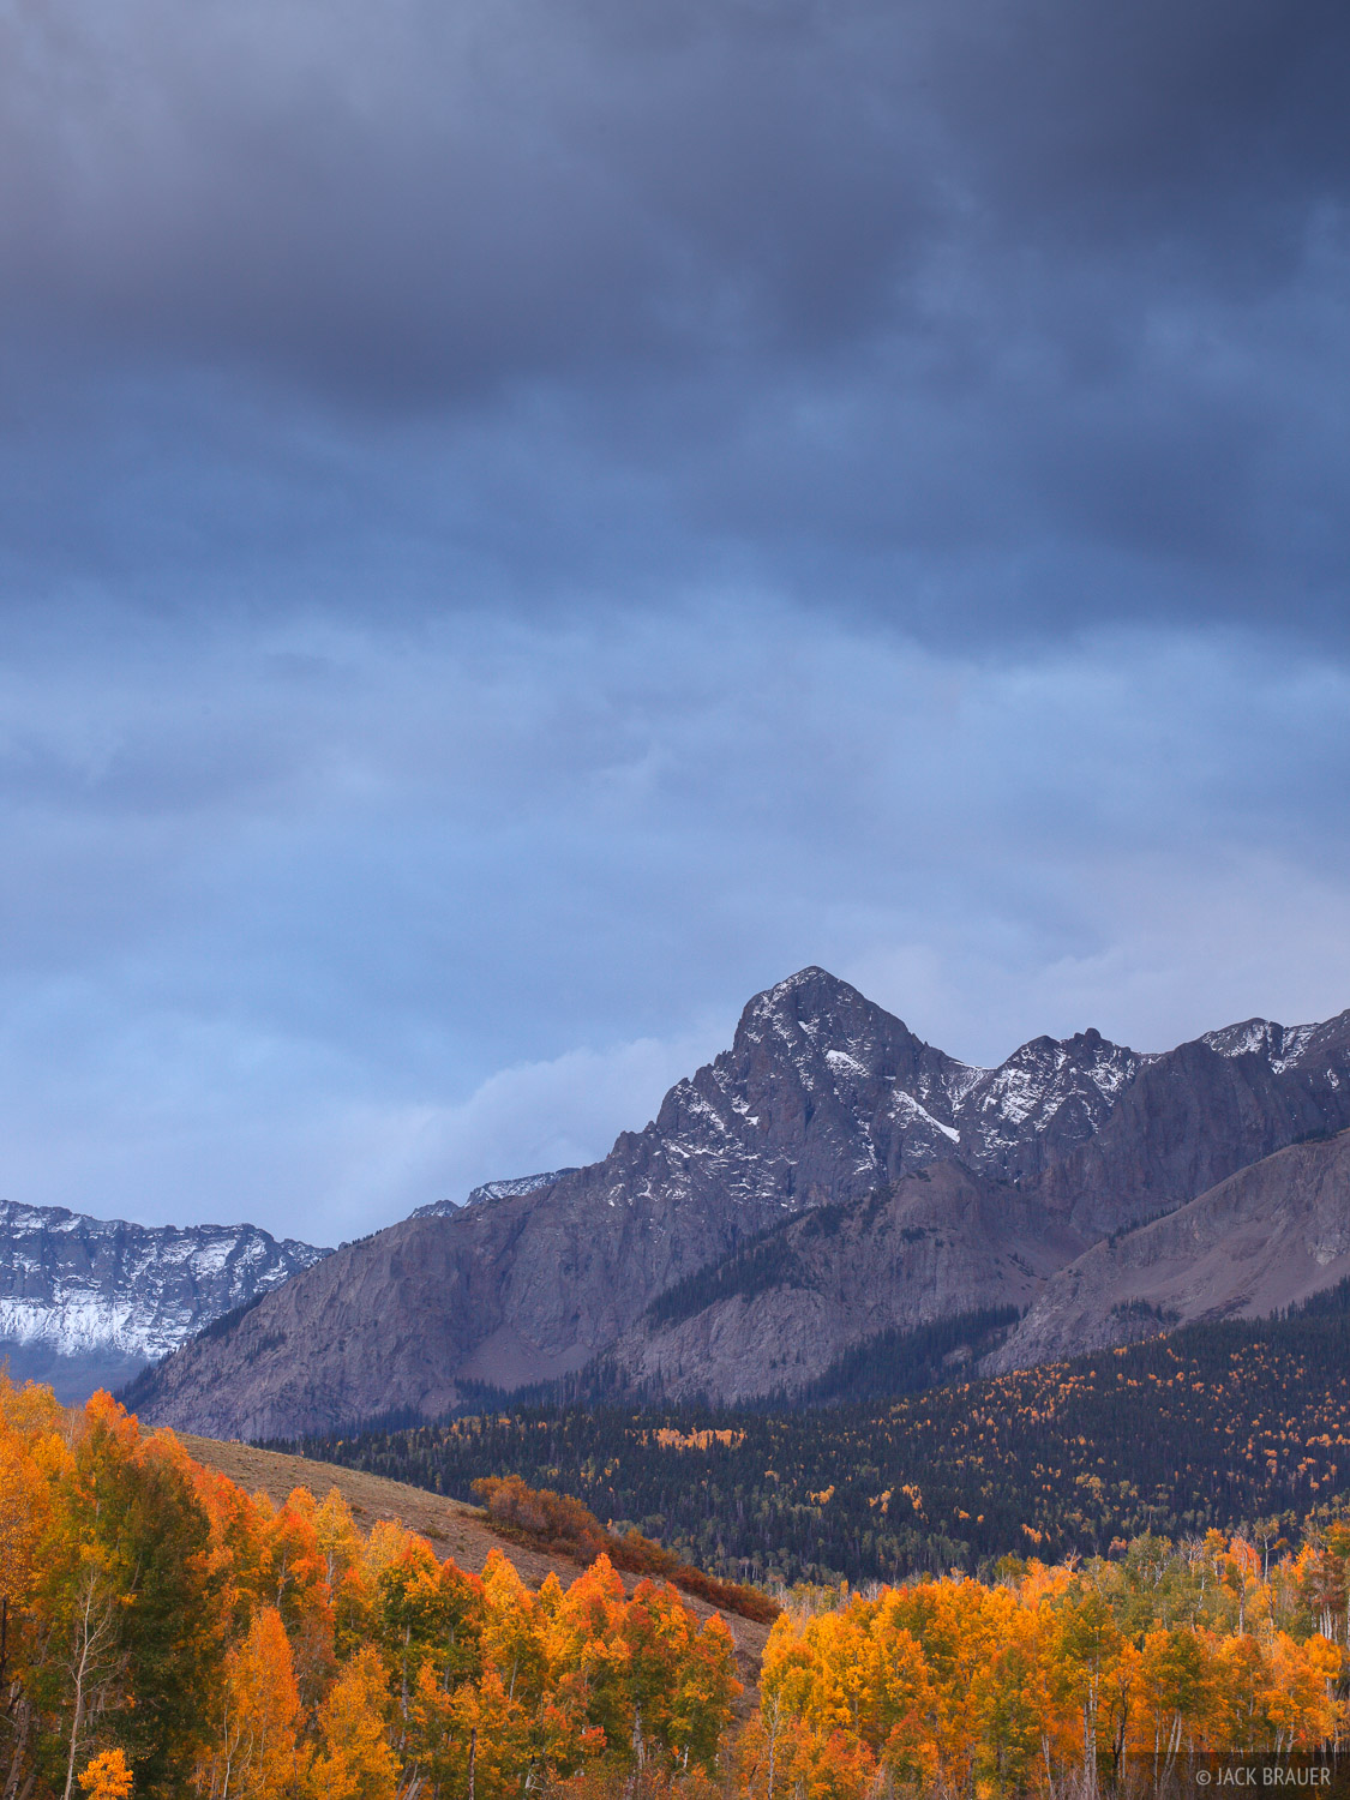 S9, Sneffels Range, San Juan Mountains, Colorado, autumn, photo